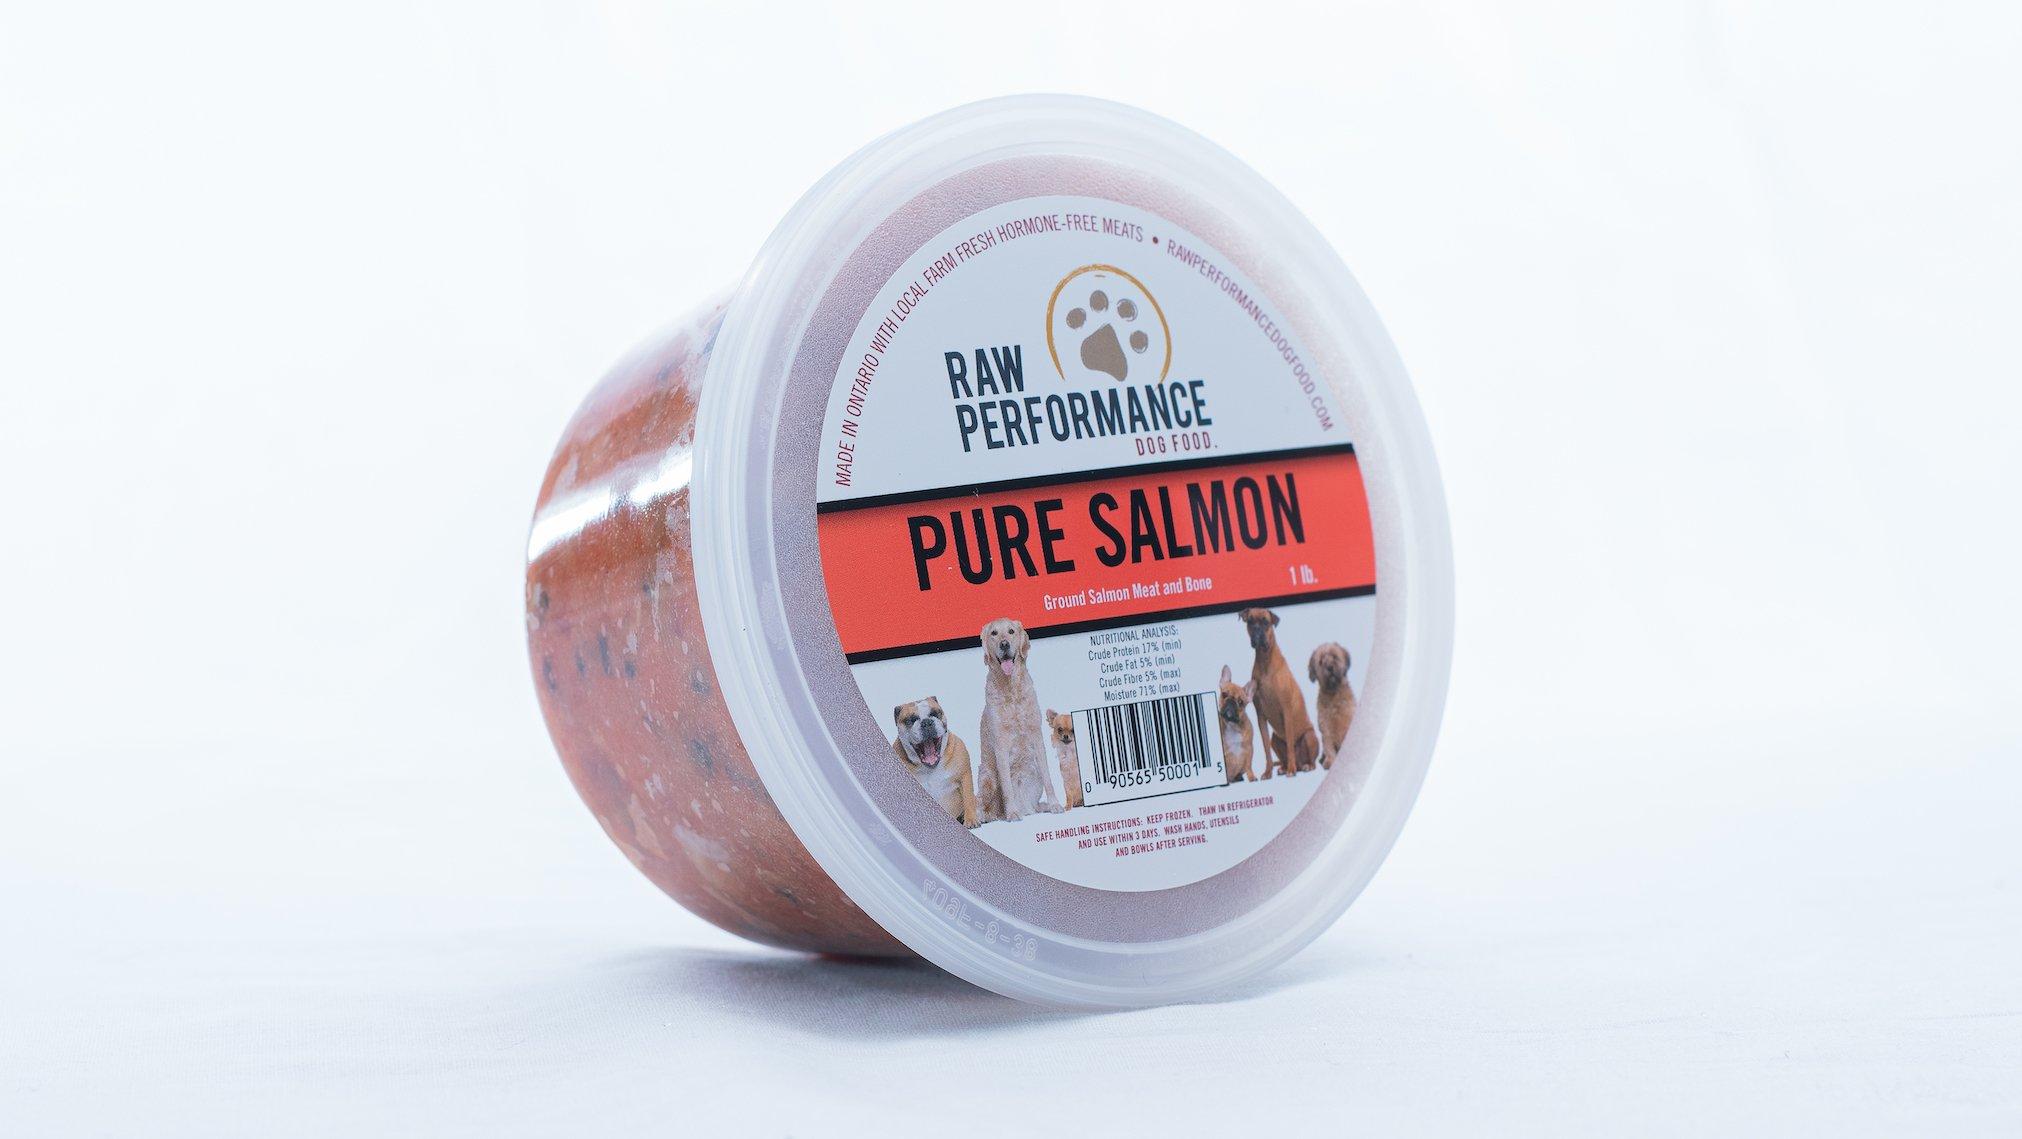 Raw Performance Pure Salmon Dog Food, 1-lb